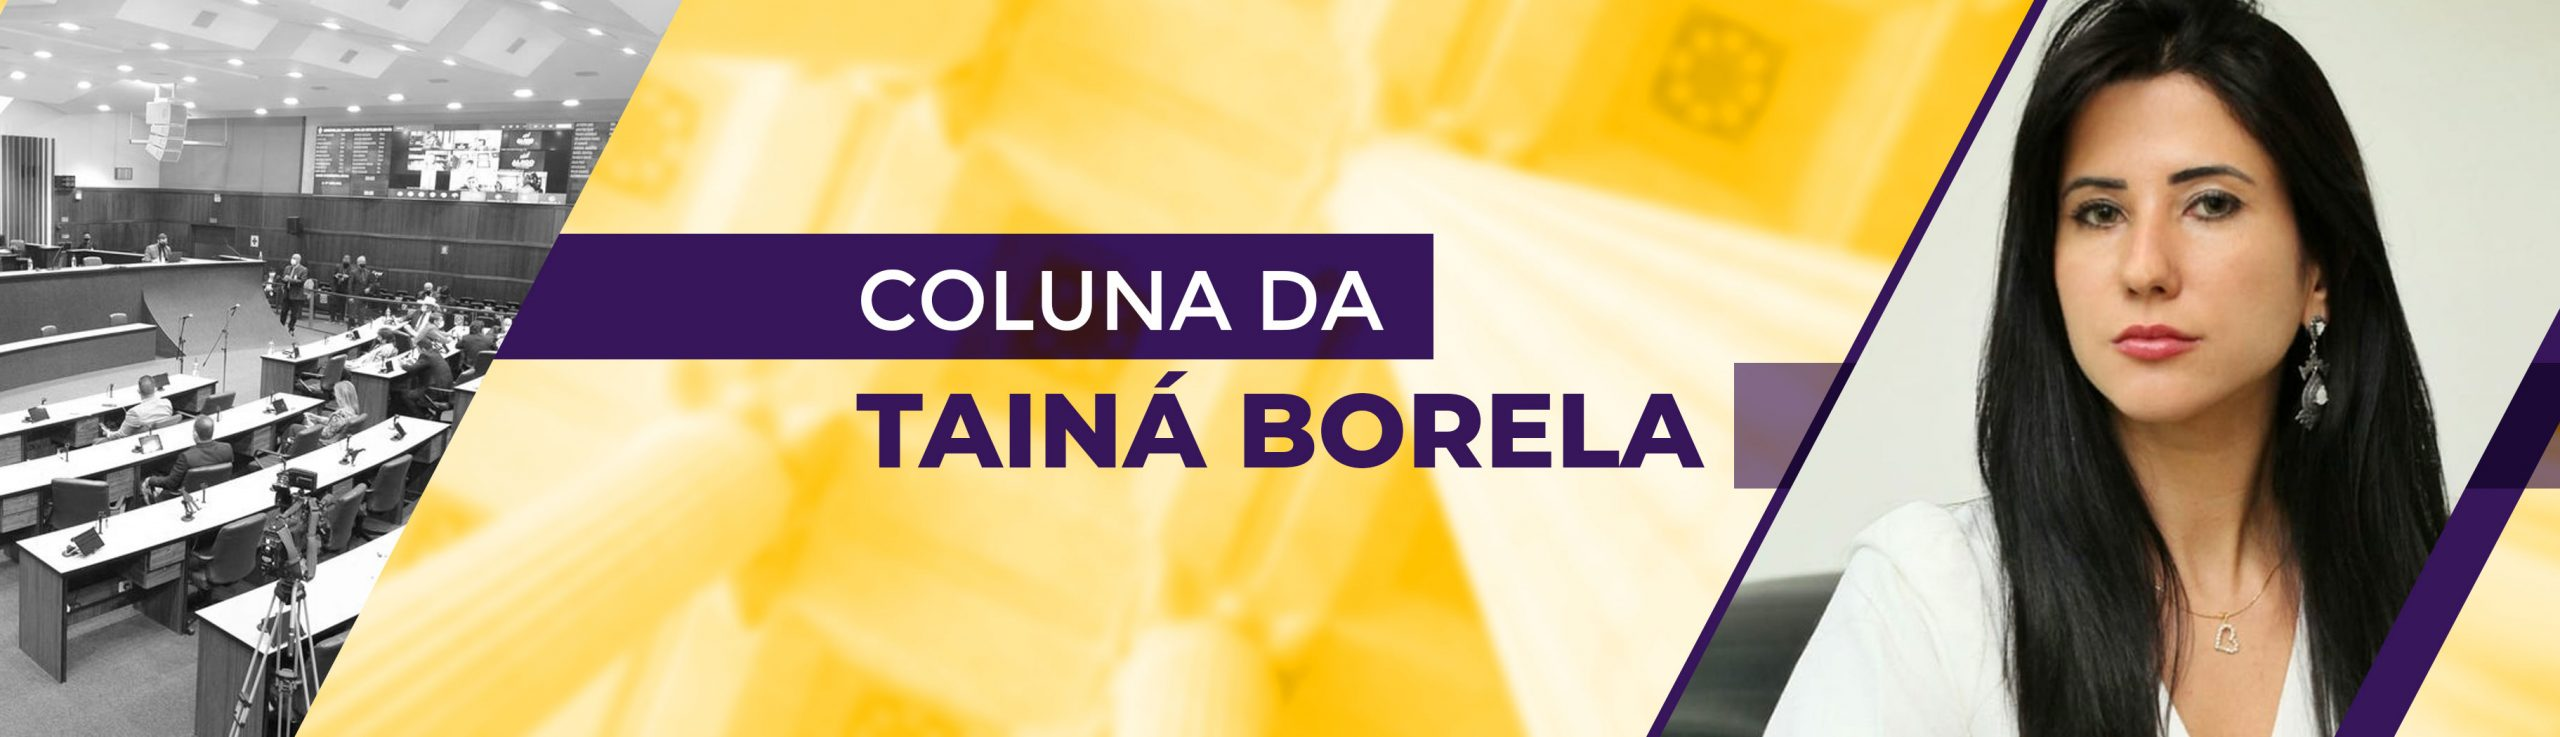 Coluna da Tainá Borela